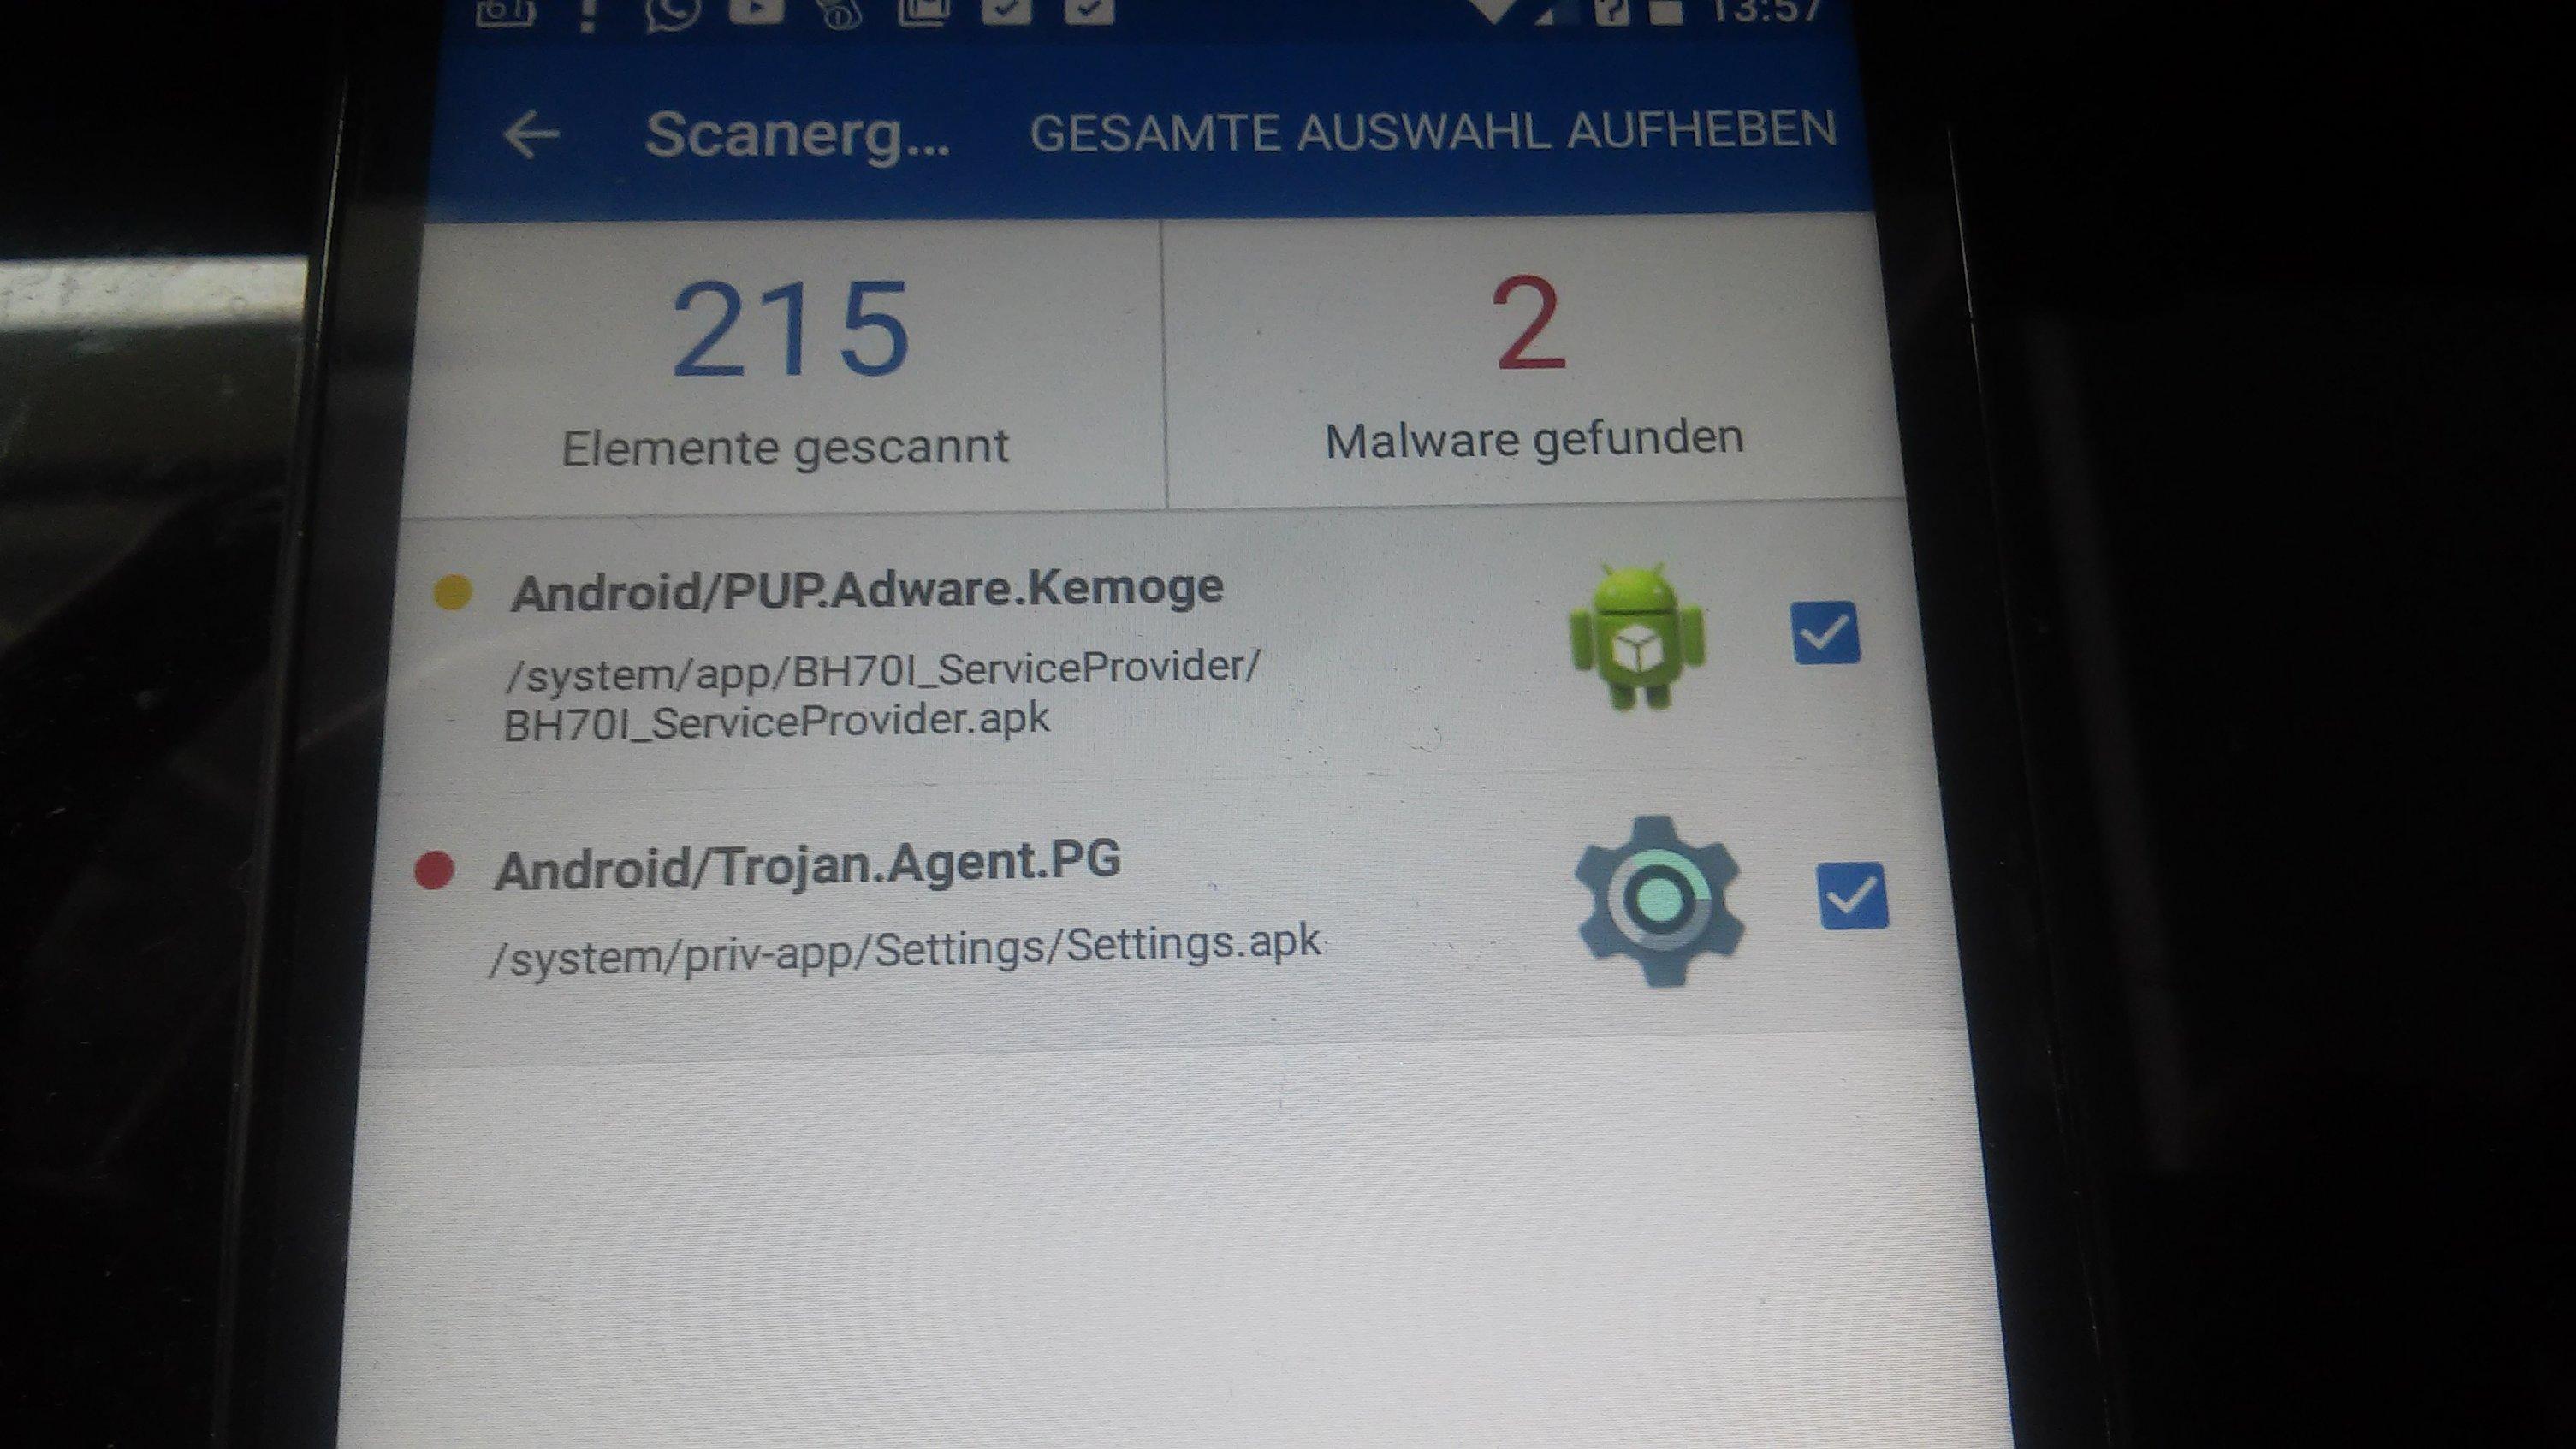 android 5 1 lollipop pup adware kemoge trojan pg